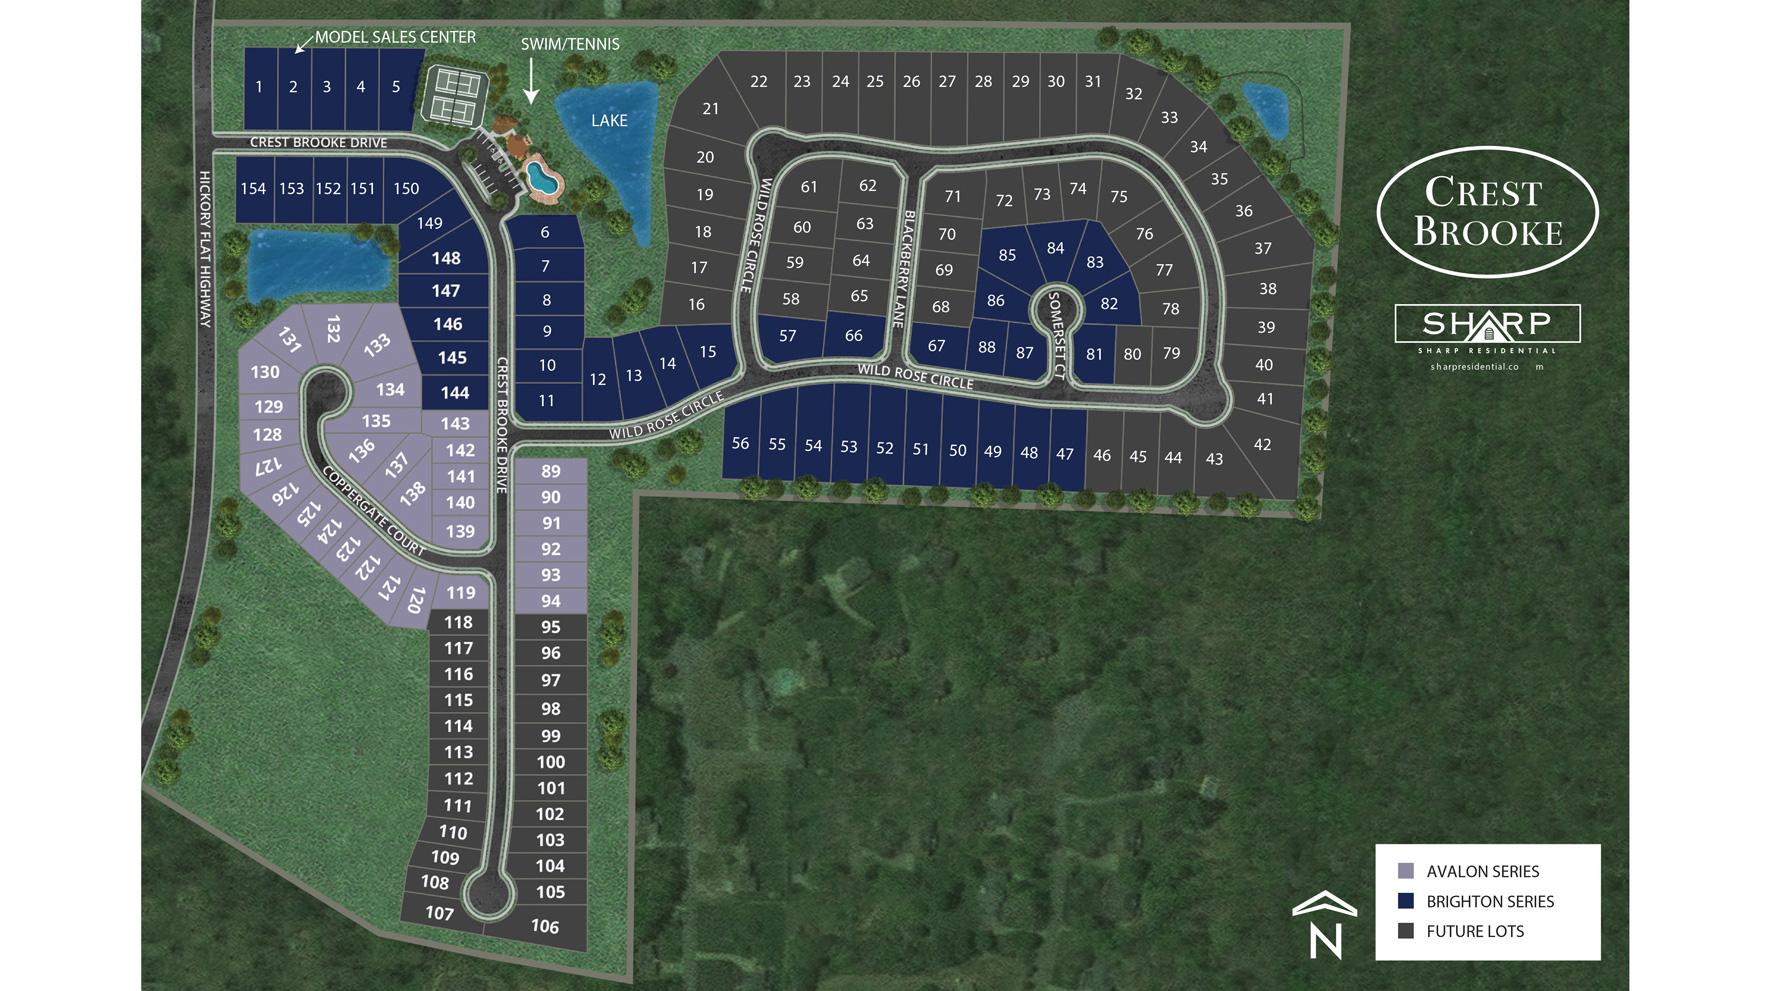 Crest Brooke Site Plan - Avalon